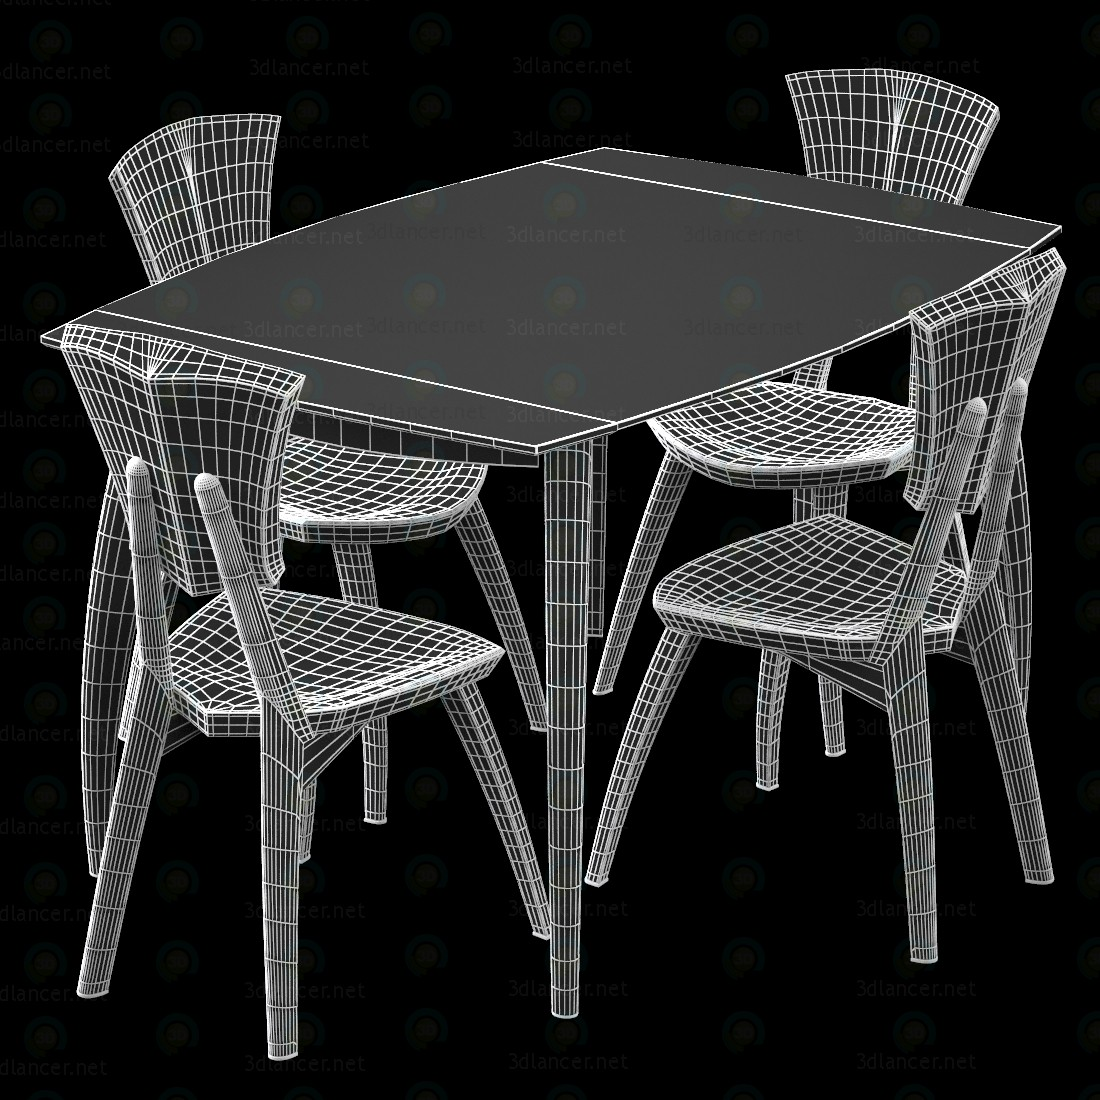 3d Lily Custom Glass Top Dining Table модель купить - ракурс